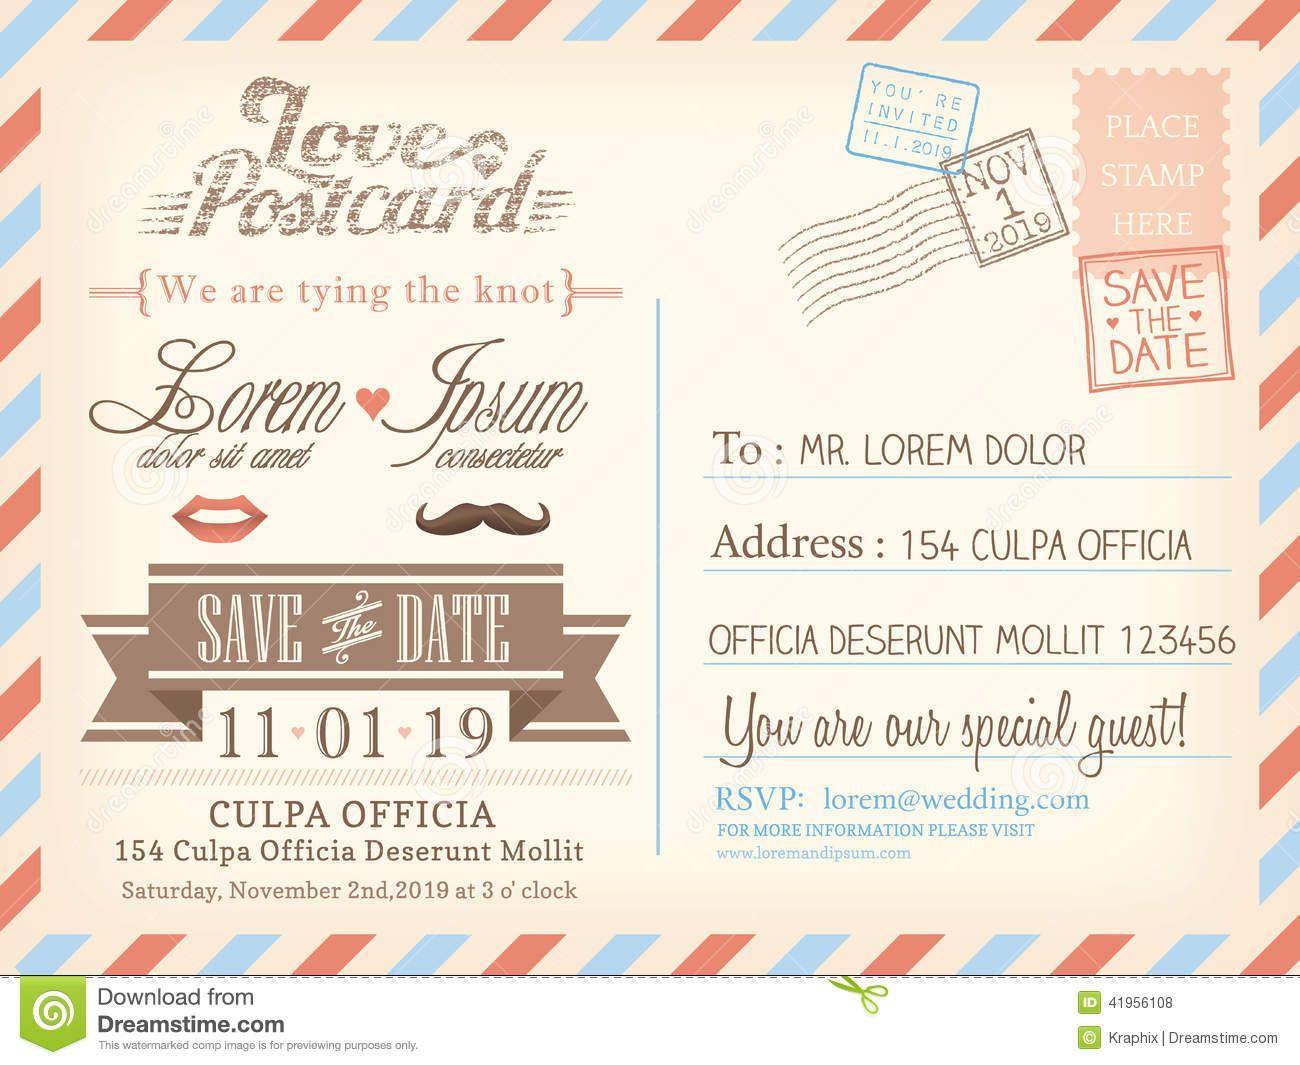 Padua Hills Theatre Southern California Weddings Fun Wedding - Wedding invitation postcards templates